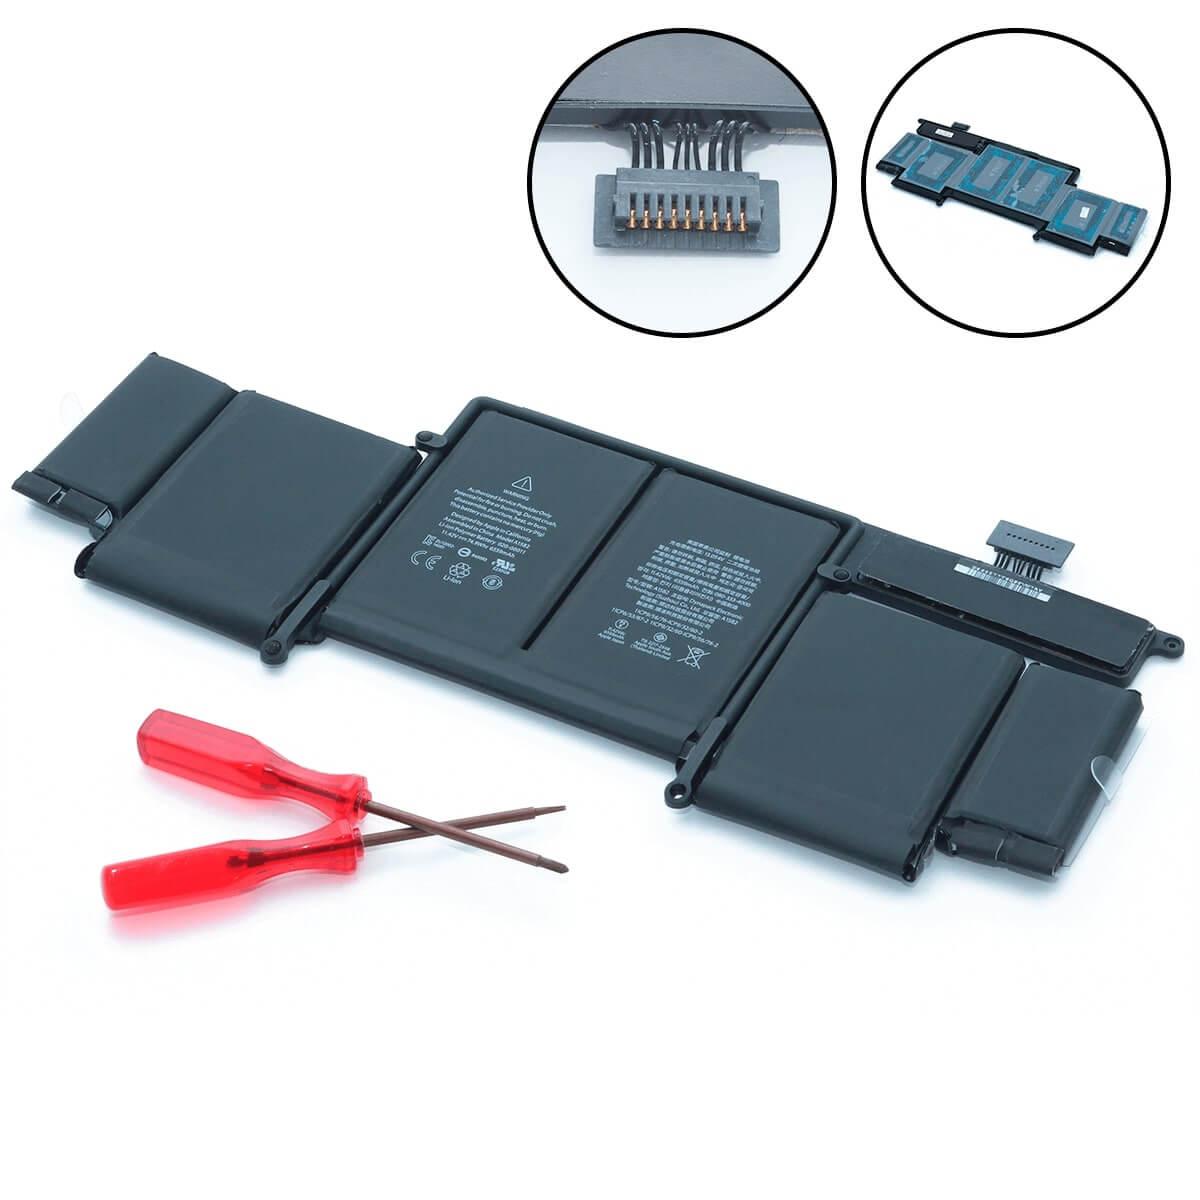 батарея для macbook pro 13 2015 a1582, батарея для a1502 2015 года